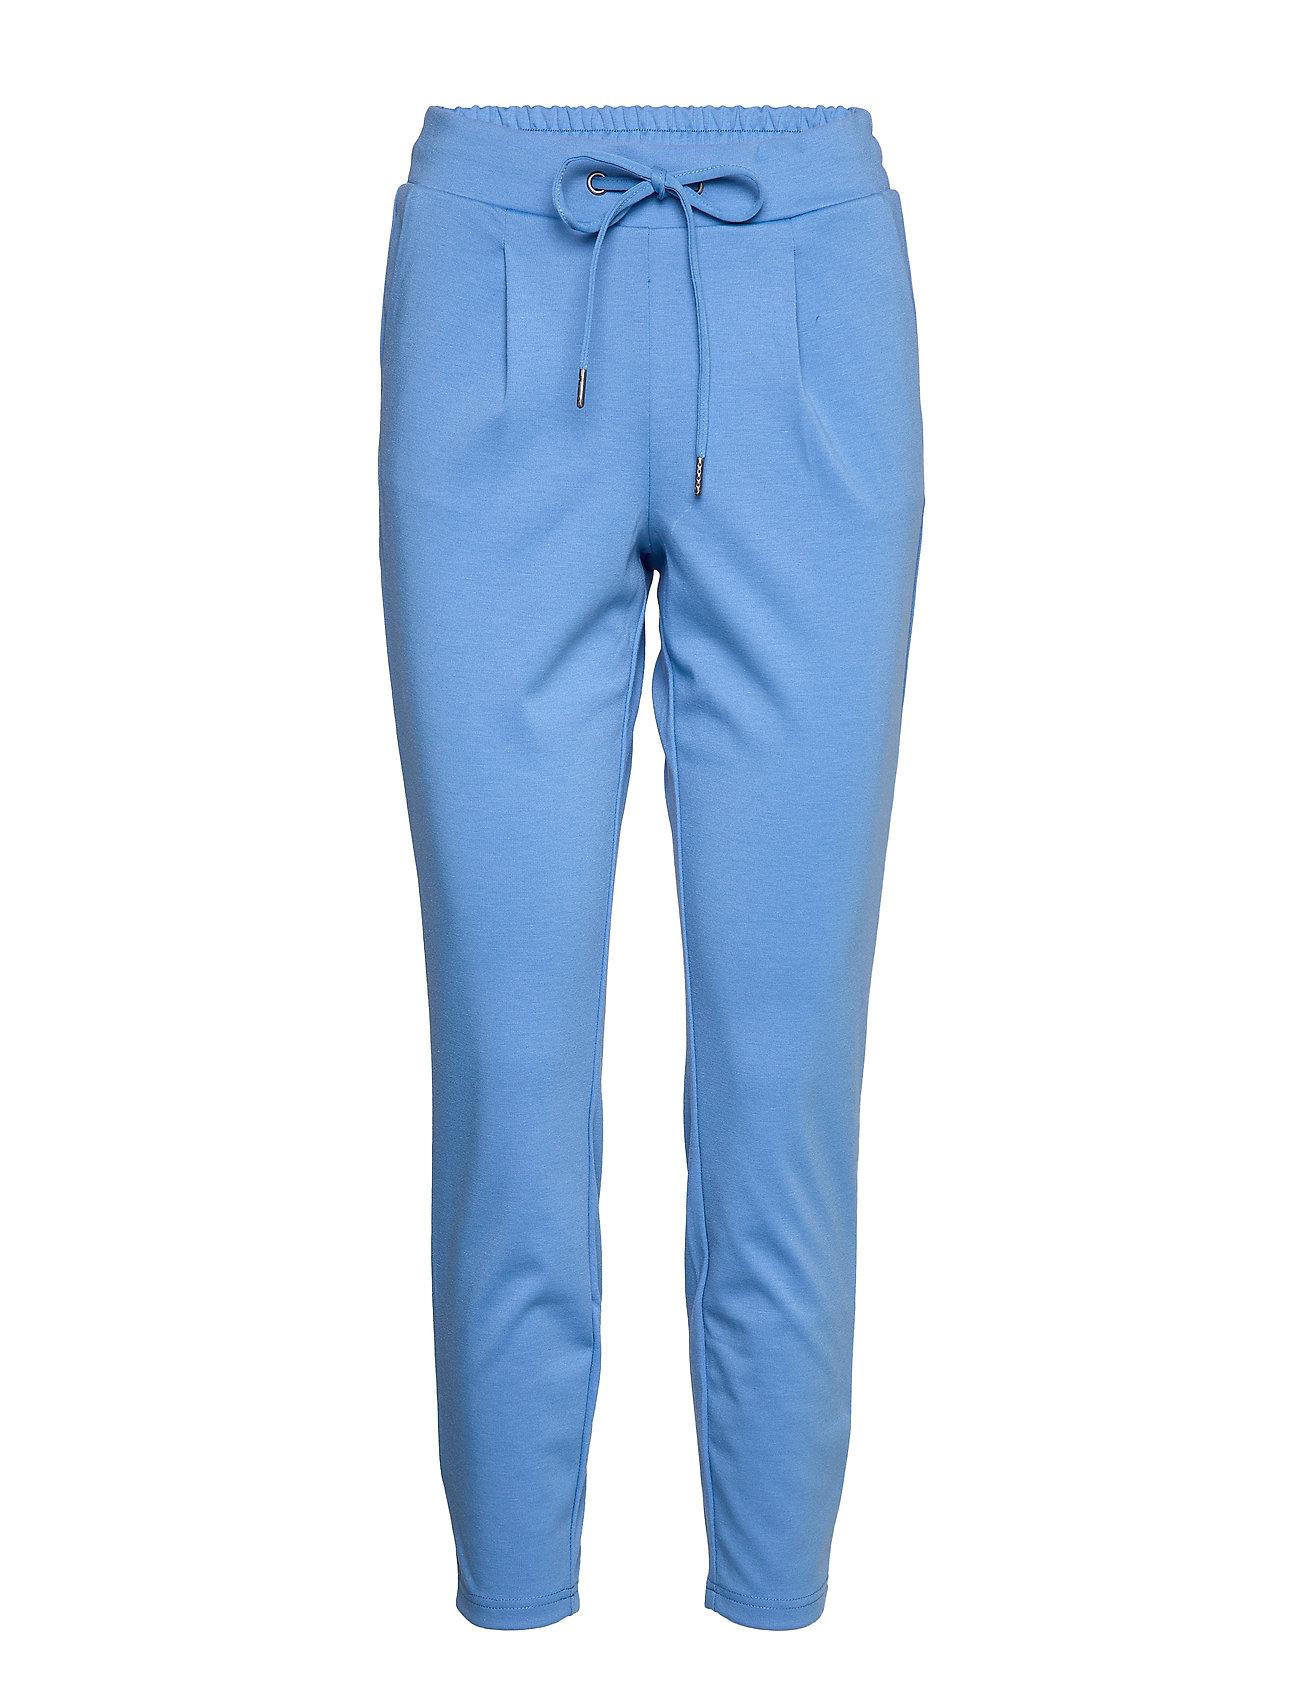 b.young Rizetta crop pants - - REGATTA BLUE